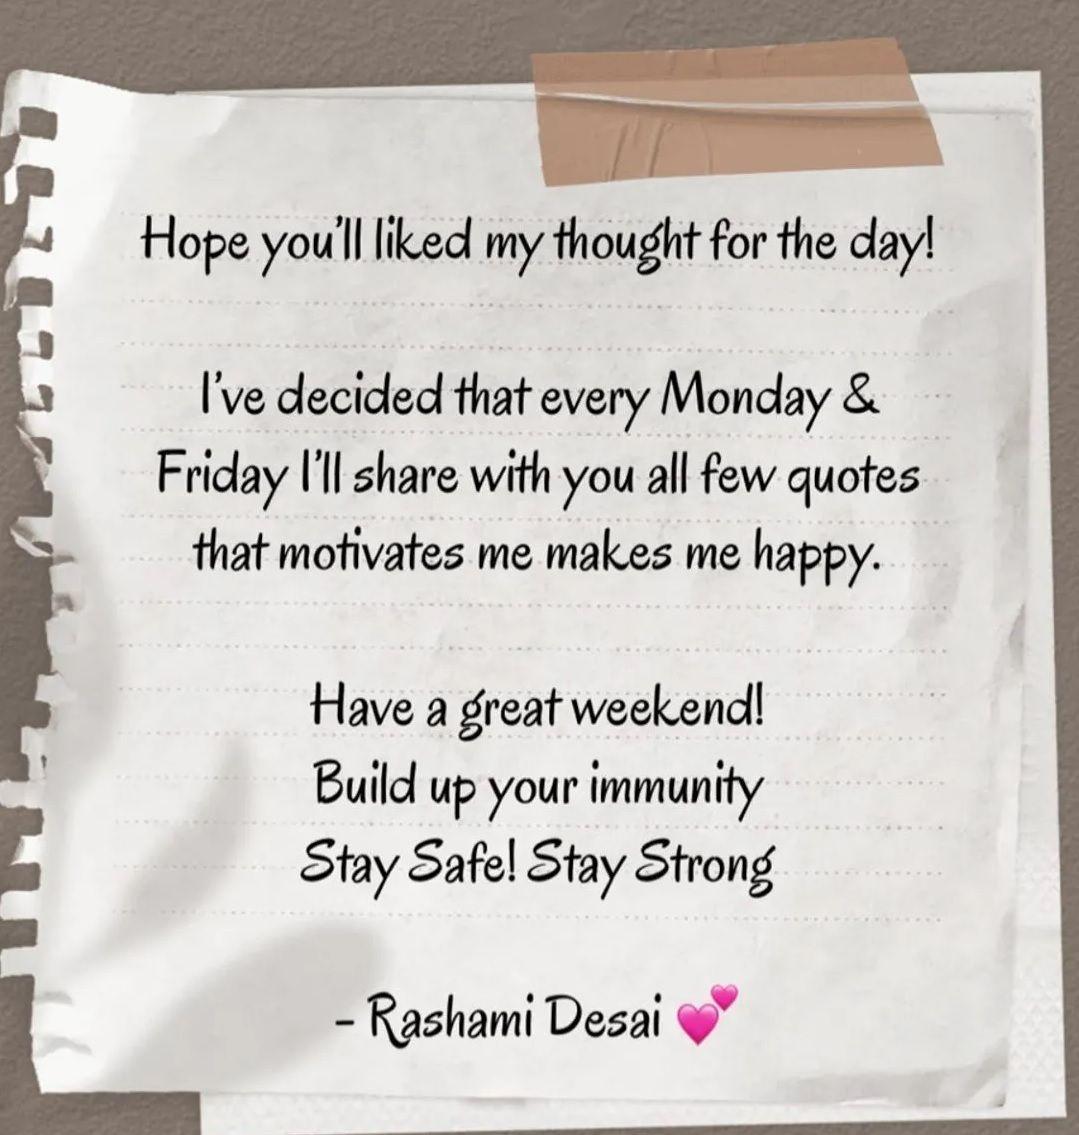 Rashmi Desai Post